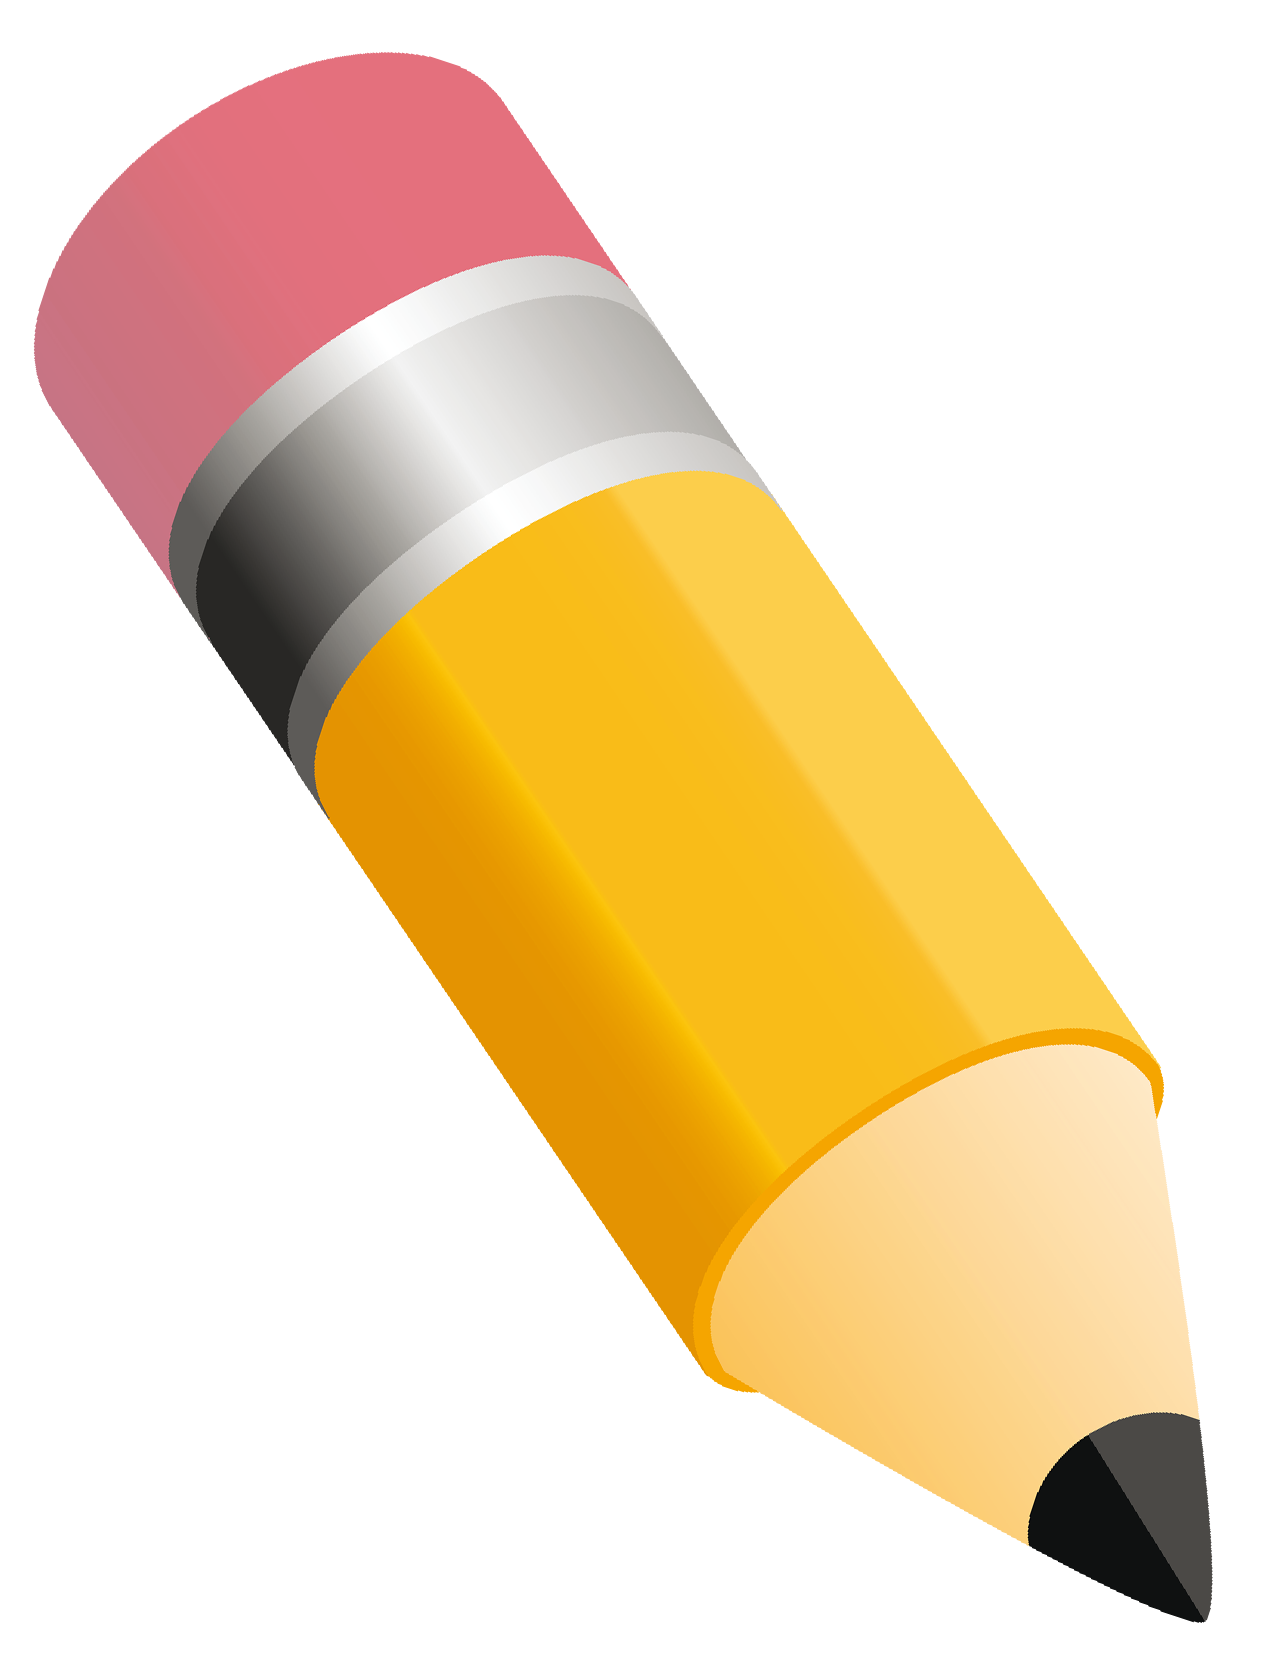 Curriculum clipart pencil. Pin by juliana nista